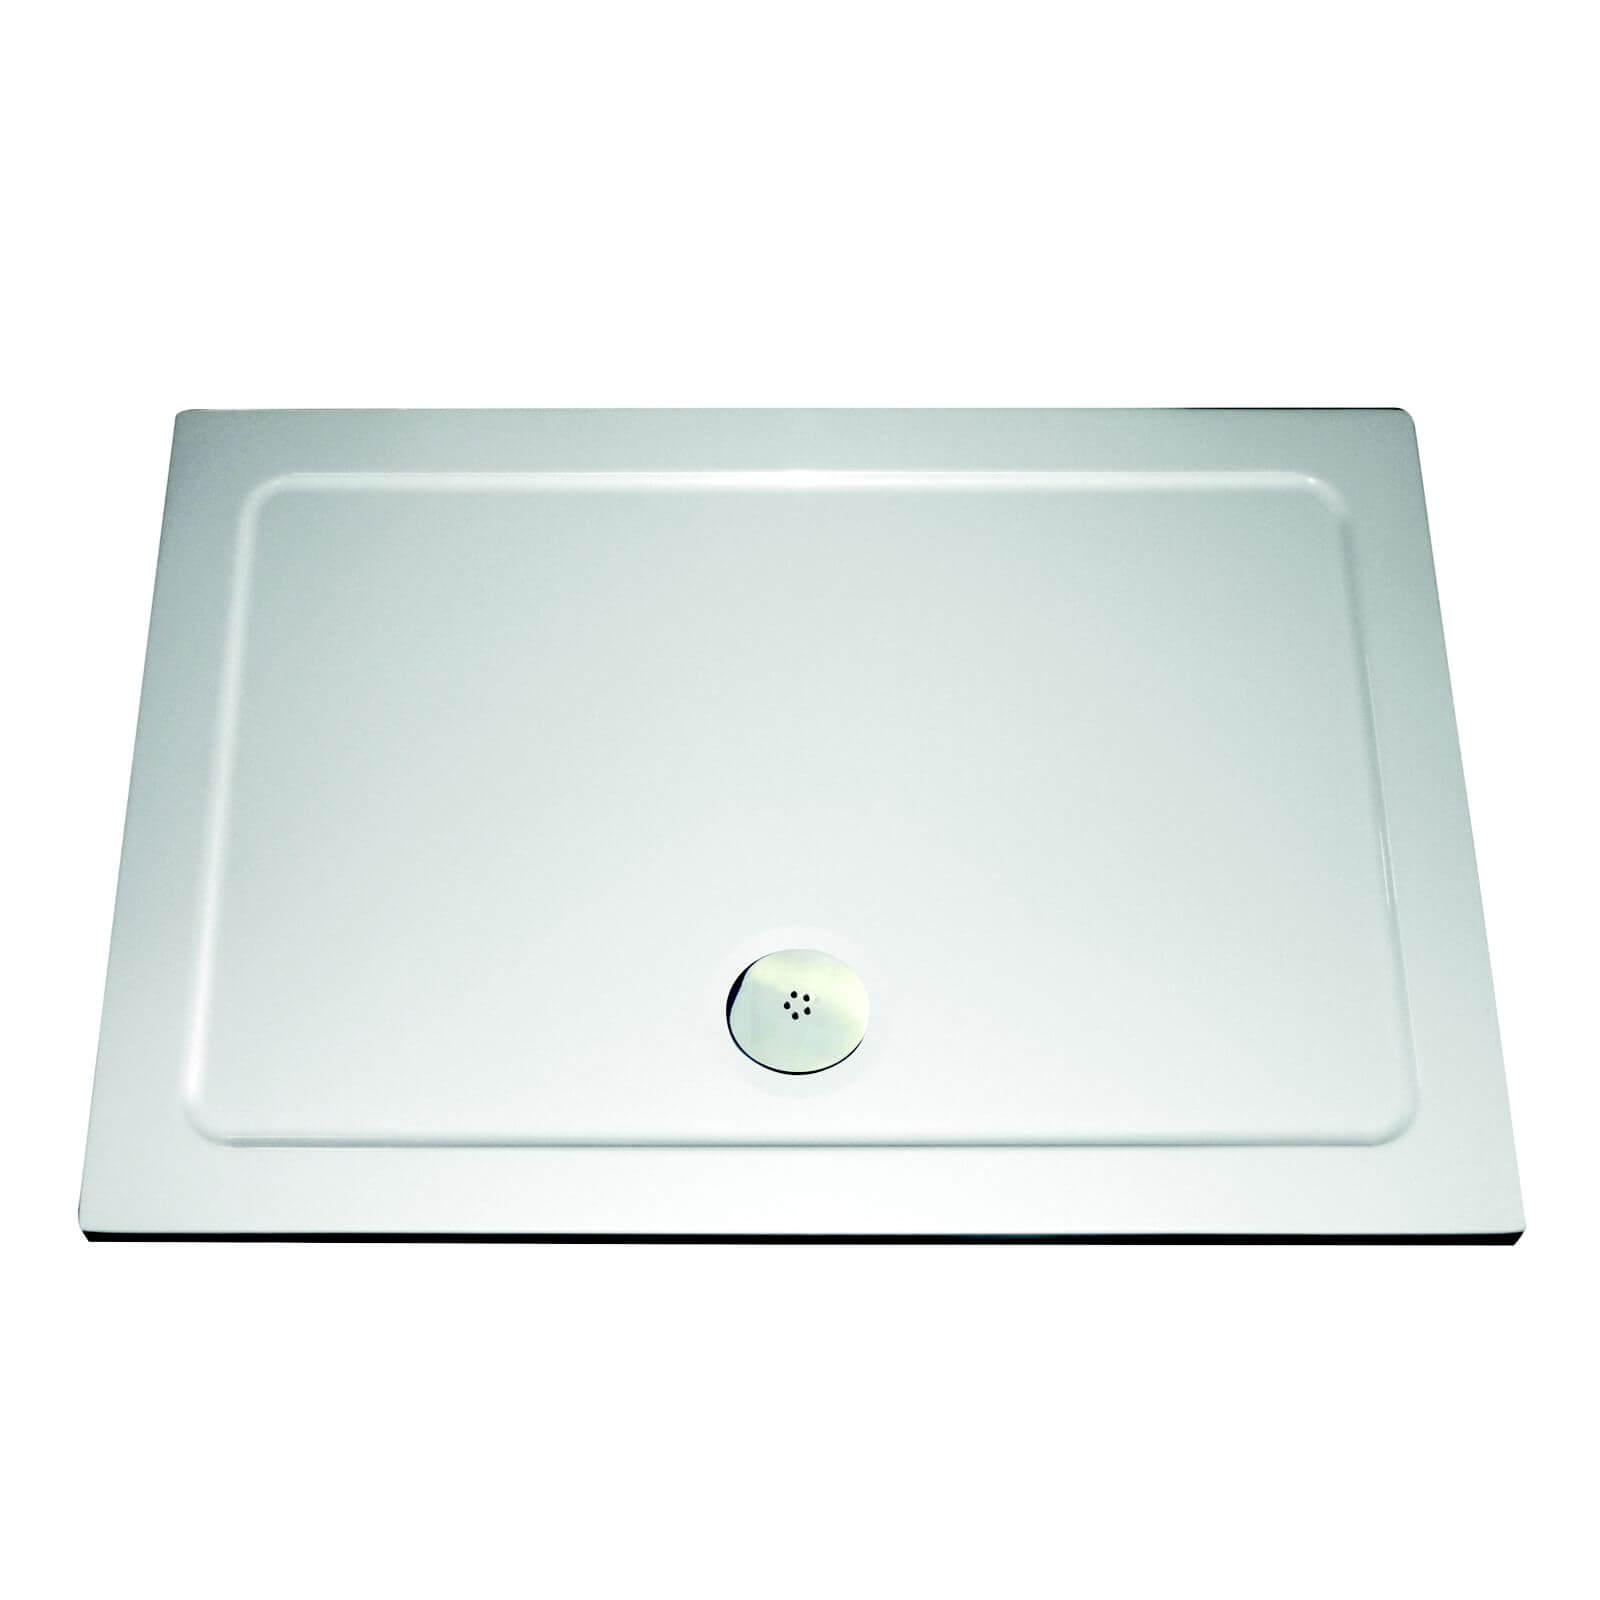 Aqualux Rectangular Shower Tray - 1700 x 800 x 35mm